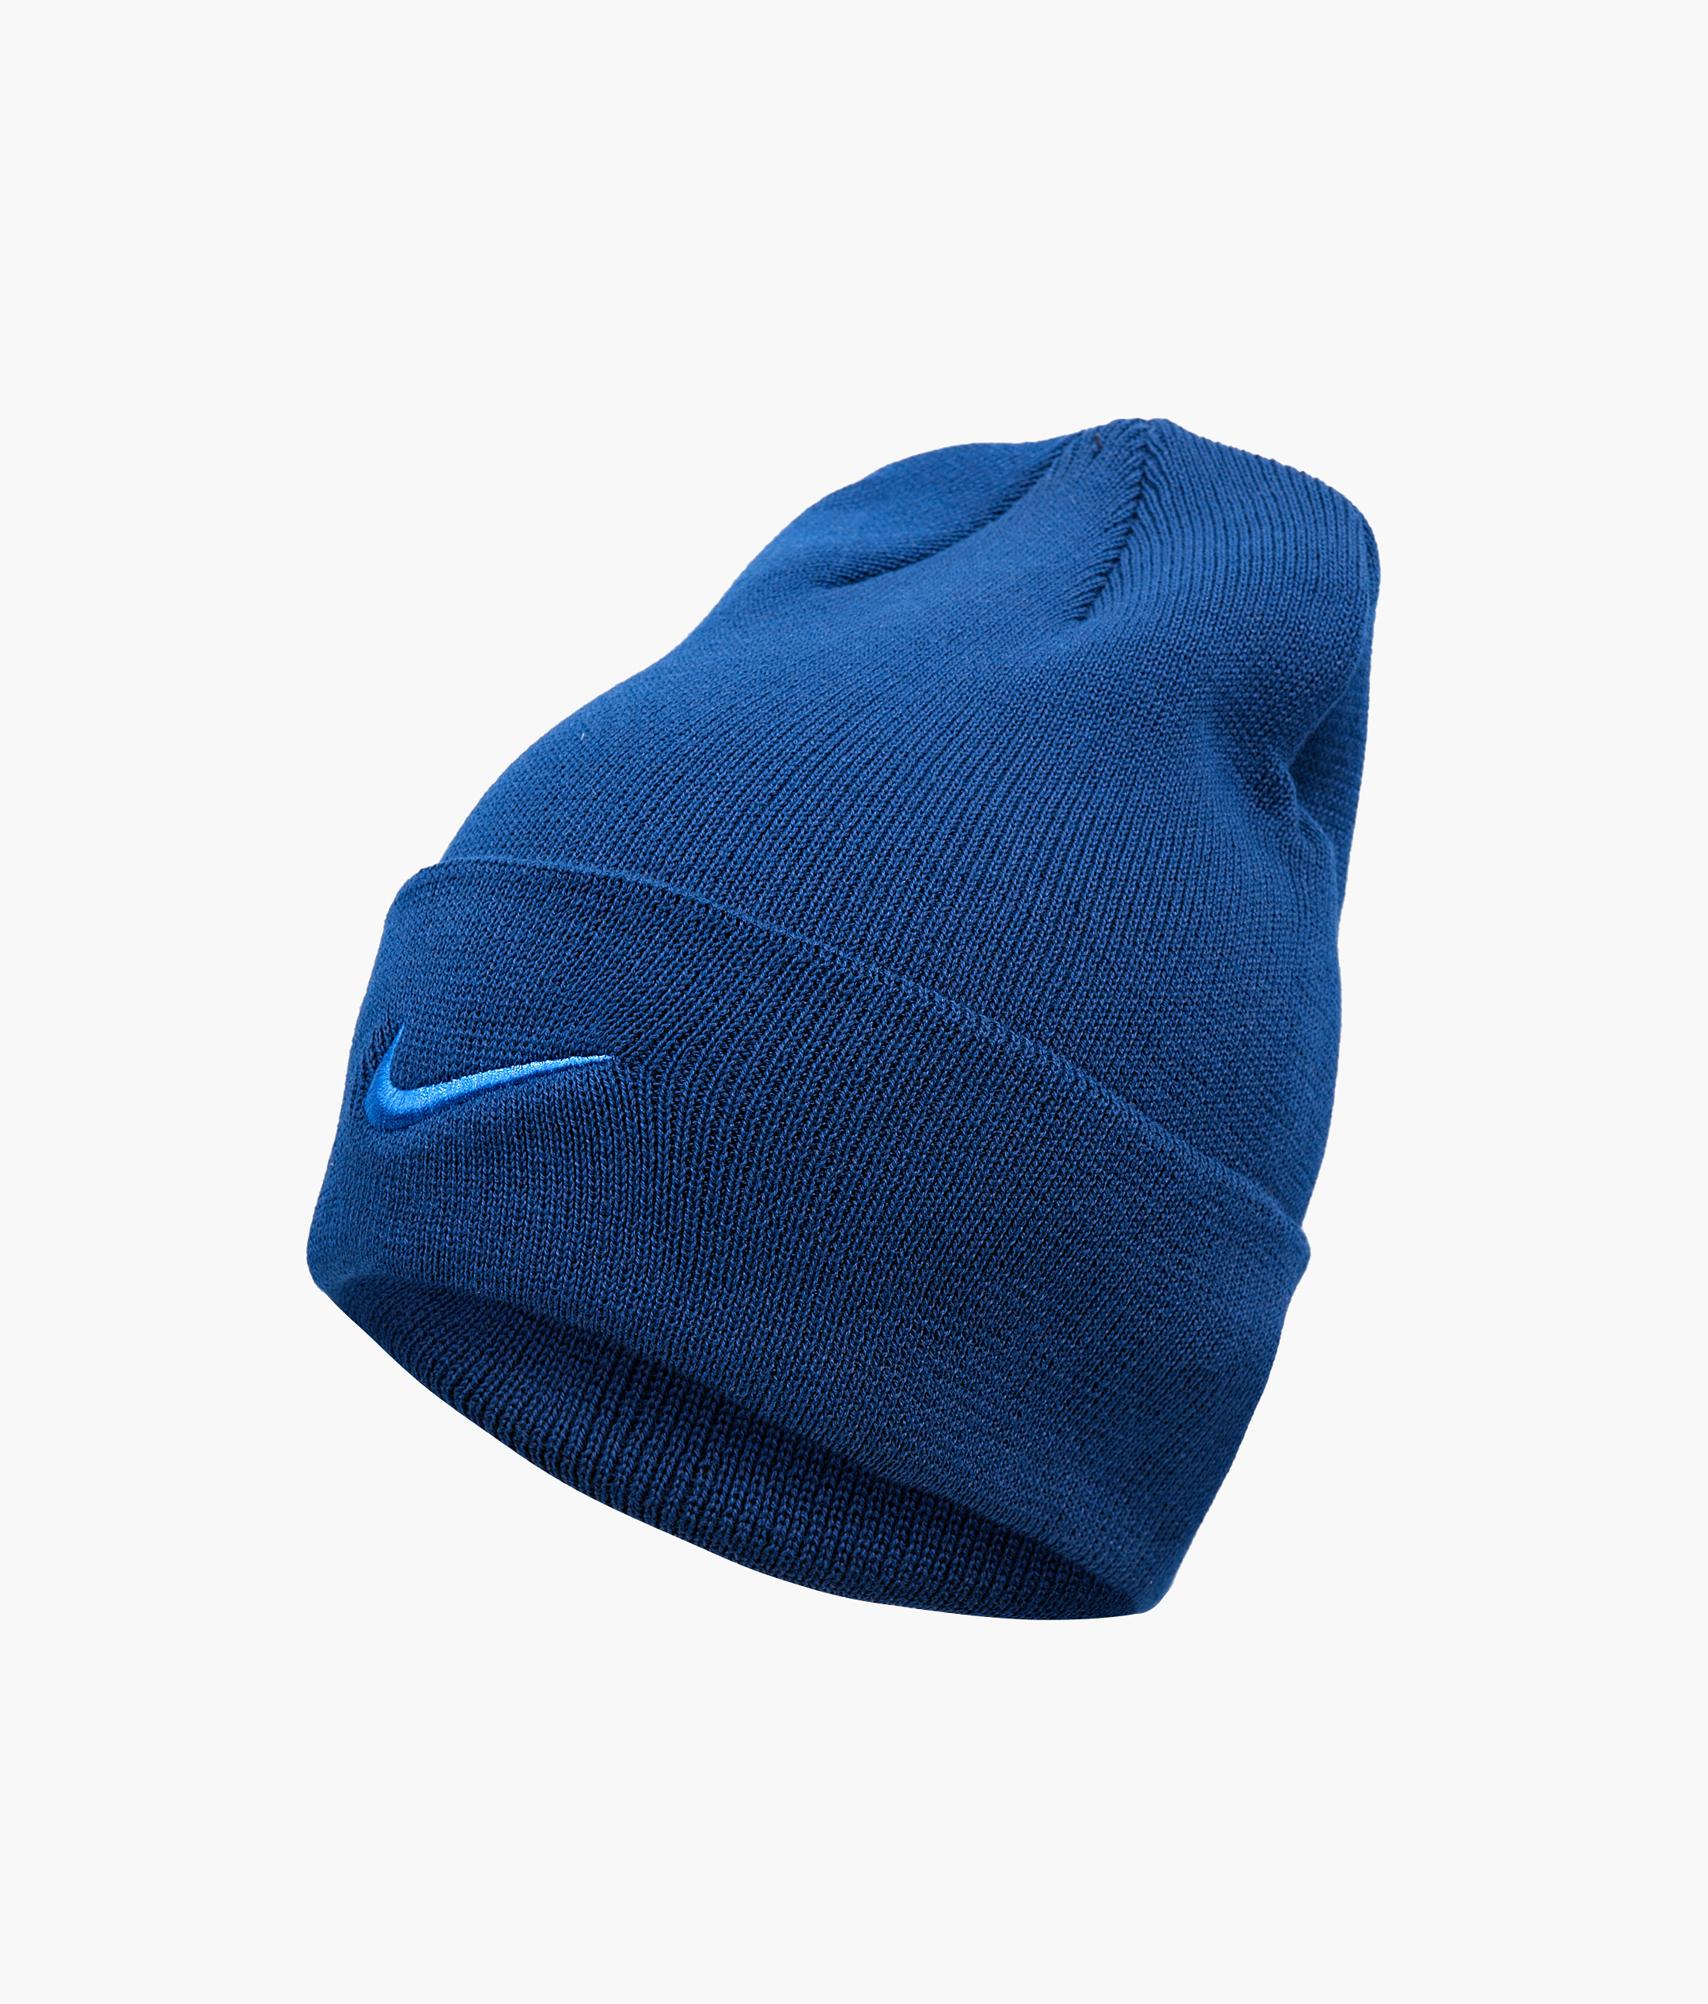 Шапка Nike Nike Цвет-Темно-Синий шапка nike nike ni464cuflav5